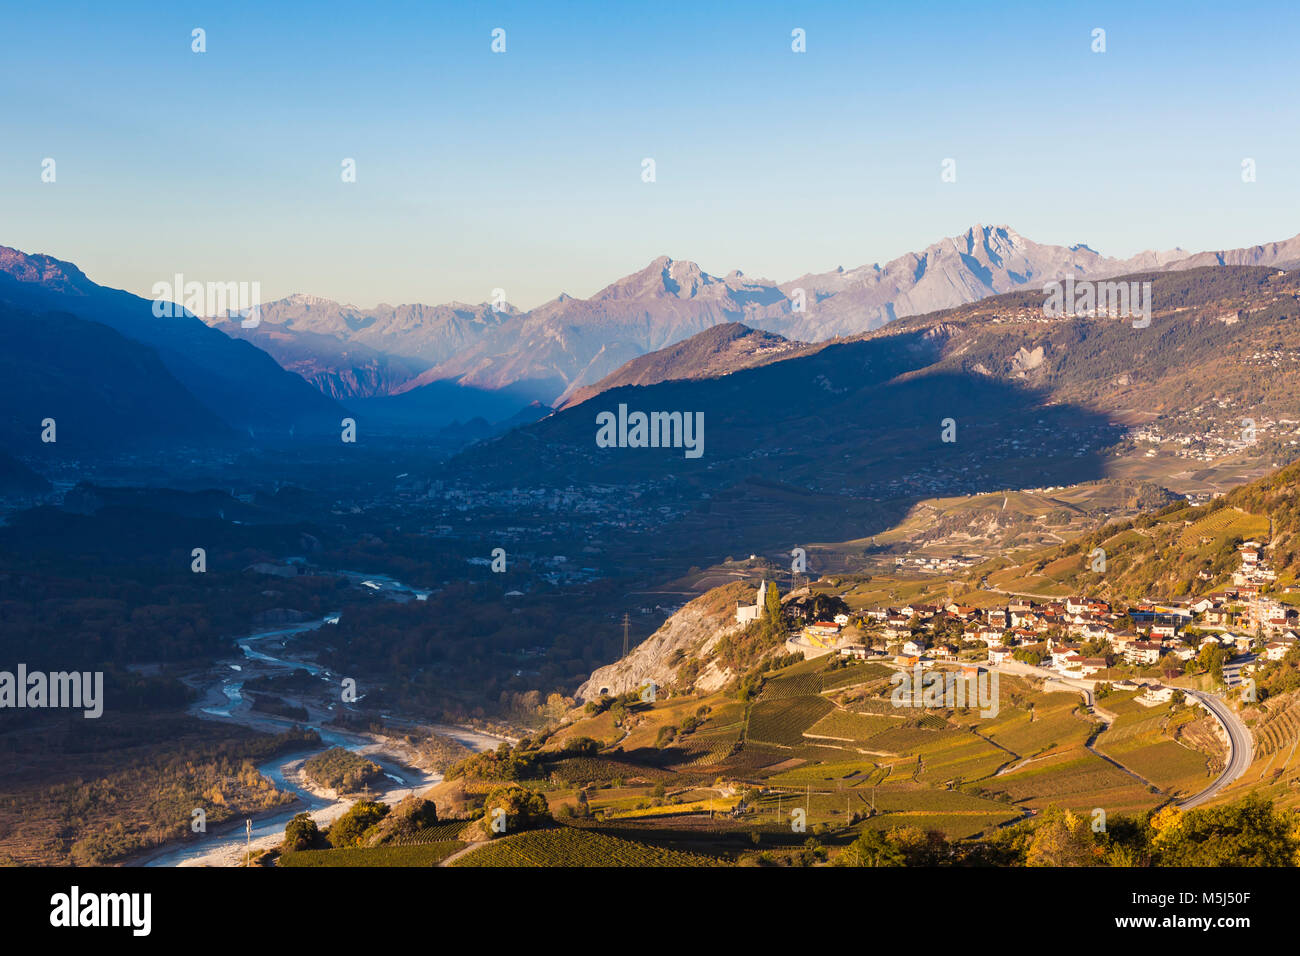 Schweiz, Kanton Wallis, Rhonetal, Rhone, Varen, frz. Varonne, Weindorf, Weinberge, Weinbau - Stock Image